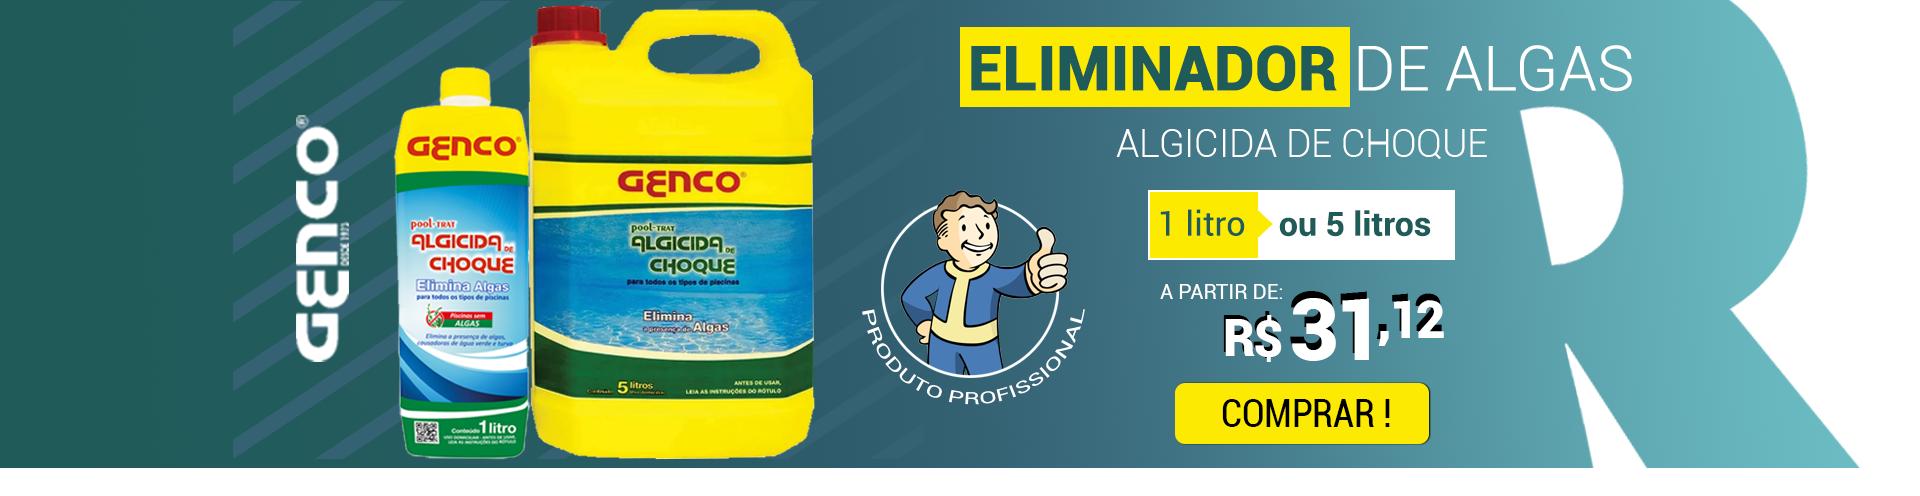 ELIMINADOR DE ALGAS ALGICIDA DE CHOQUE GENCO